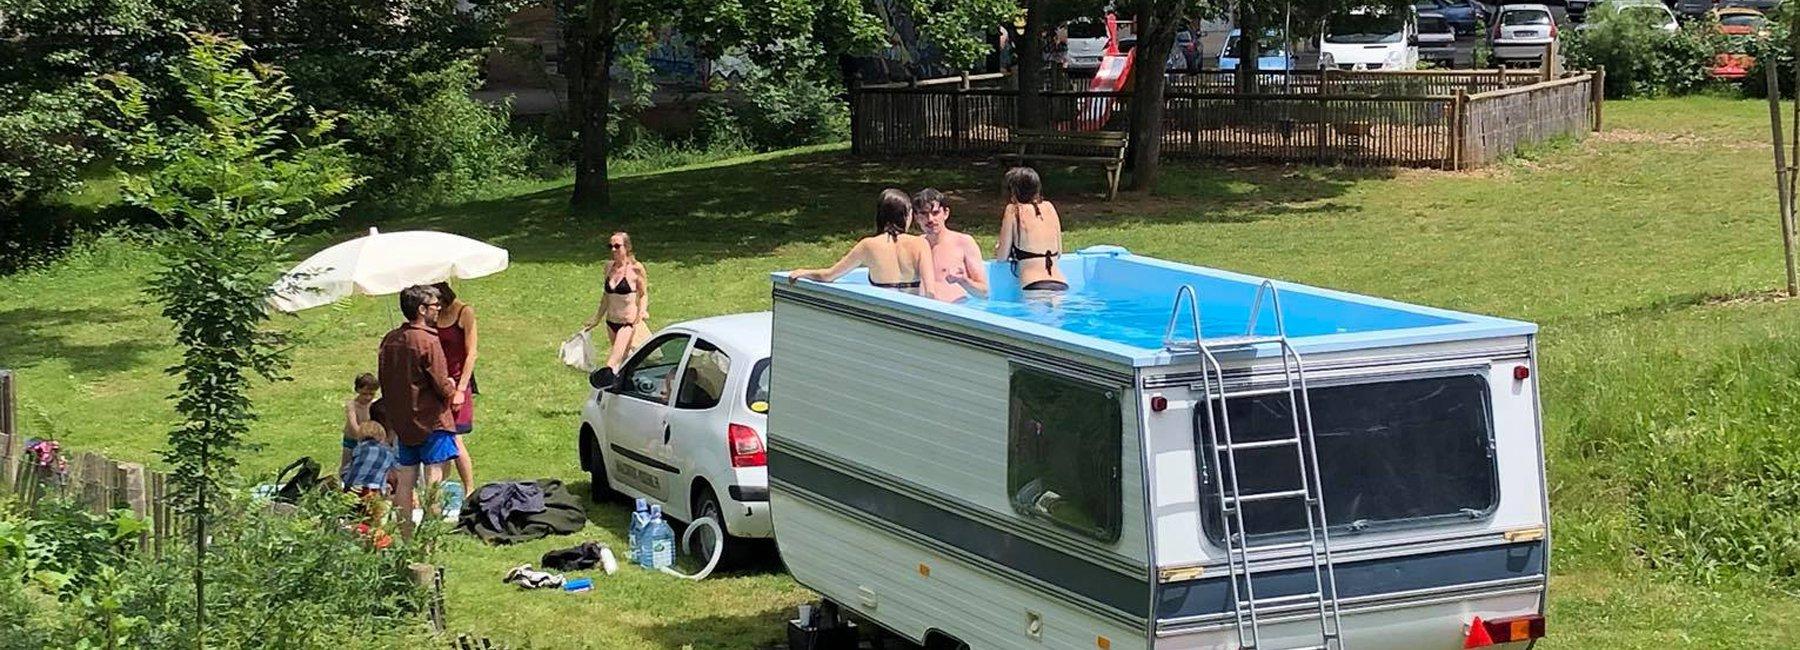 benedetto-bufalino-pool-caravan-noko-01.jpg